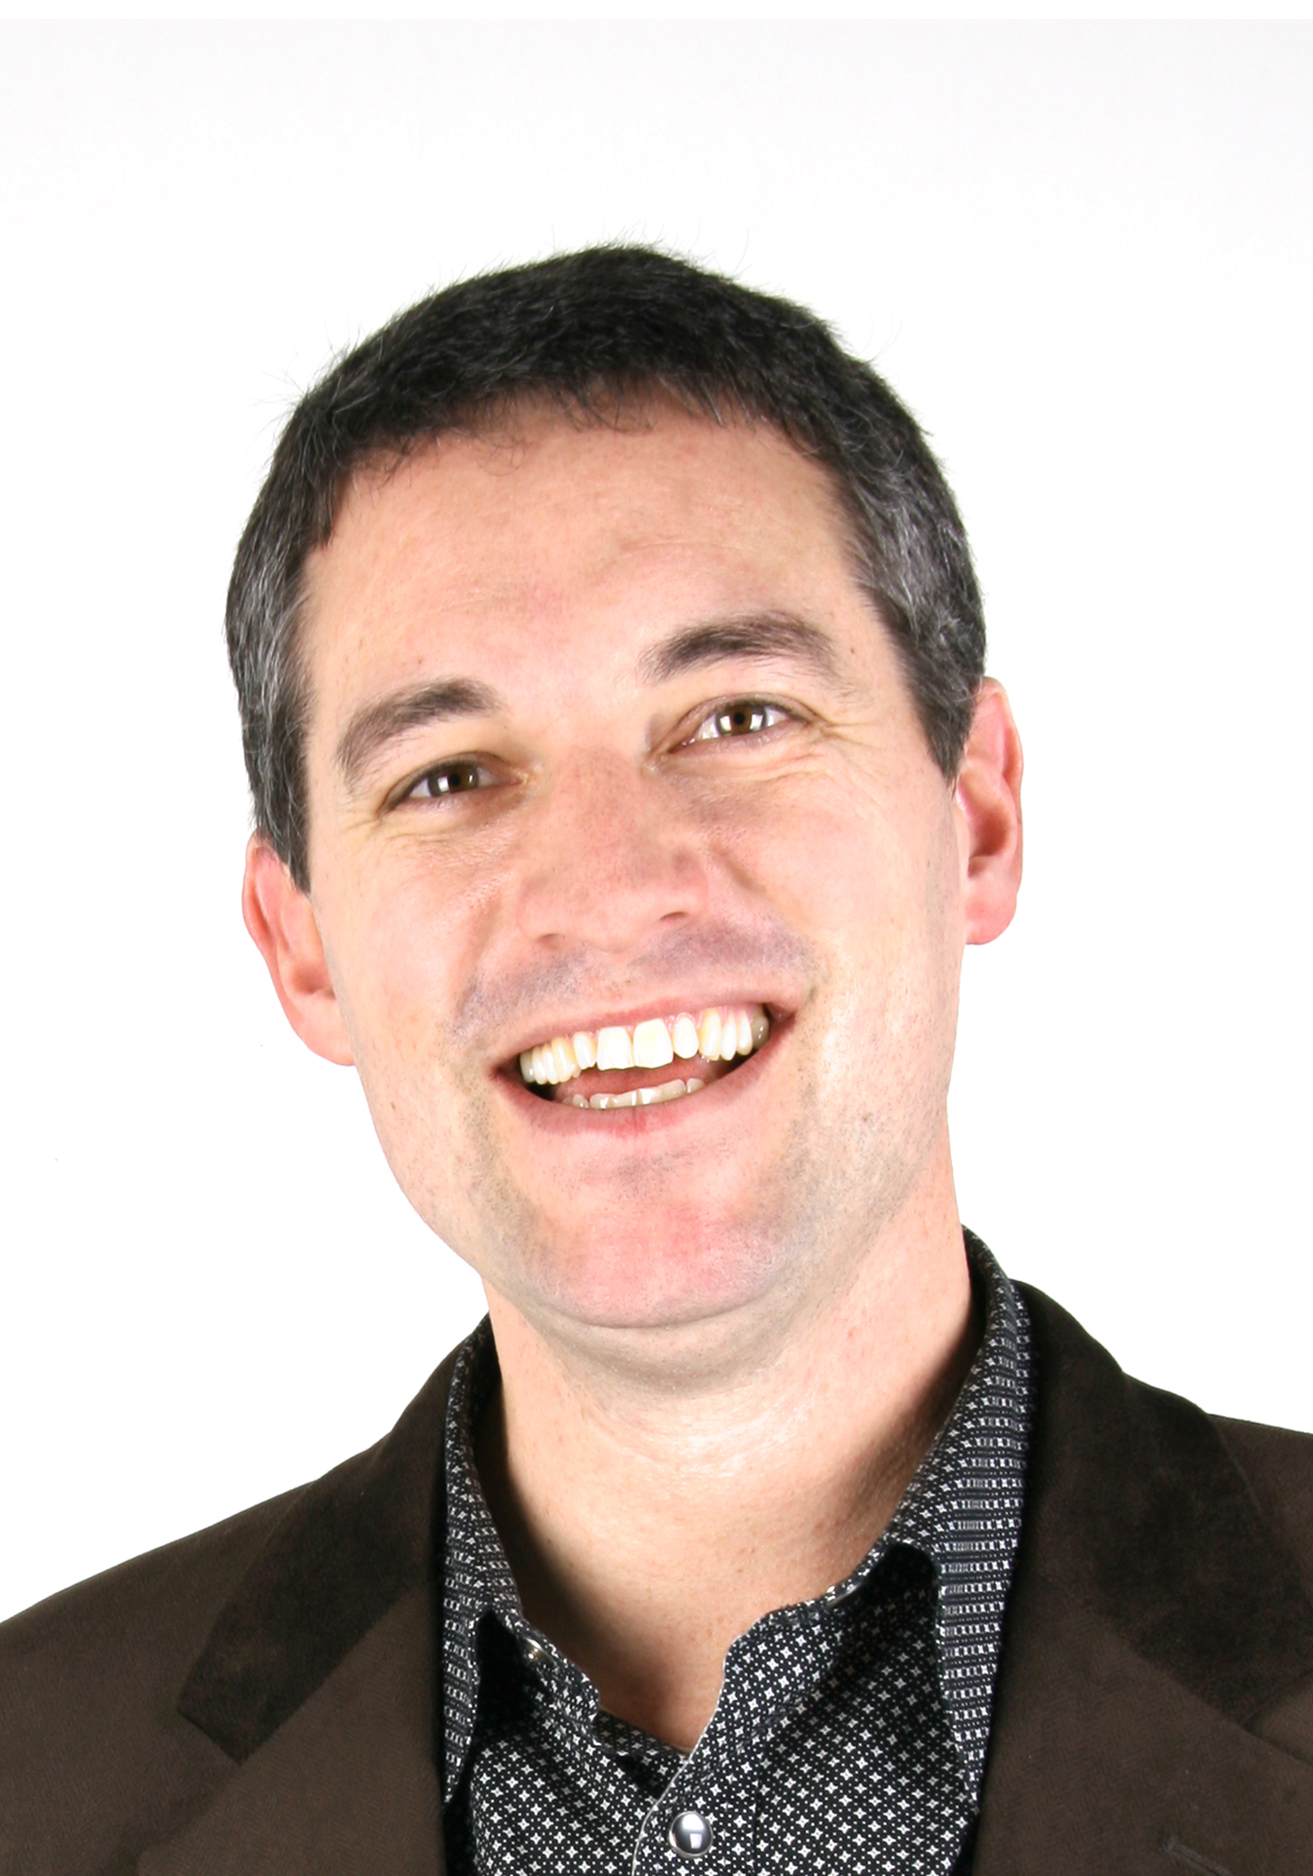 Eric Wilmot